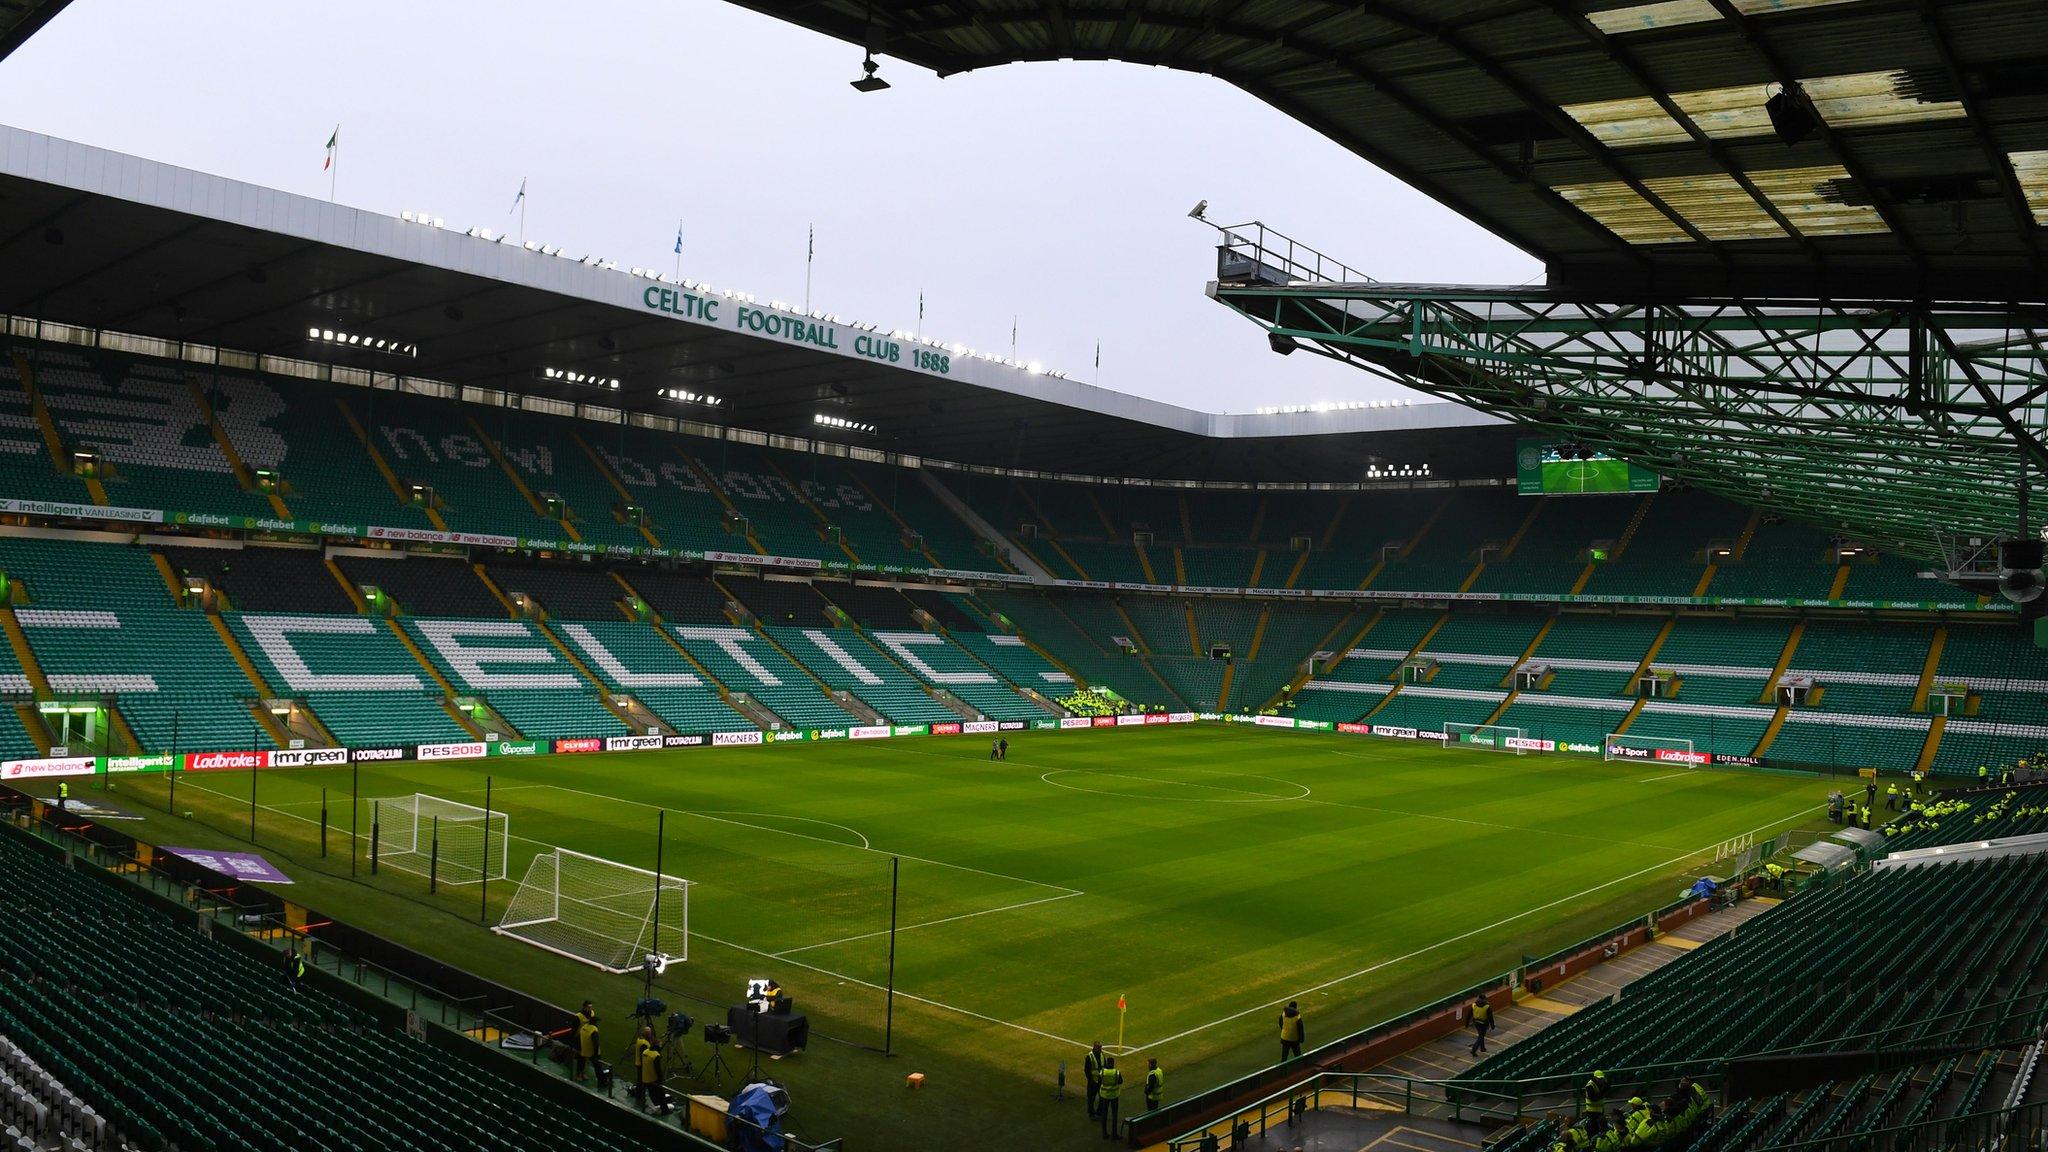 Brendan Rodgers: Celtic Park's new hybrid pitch 'slightly diseased'